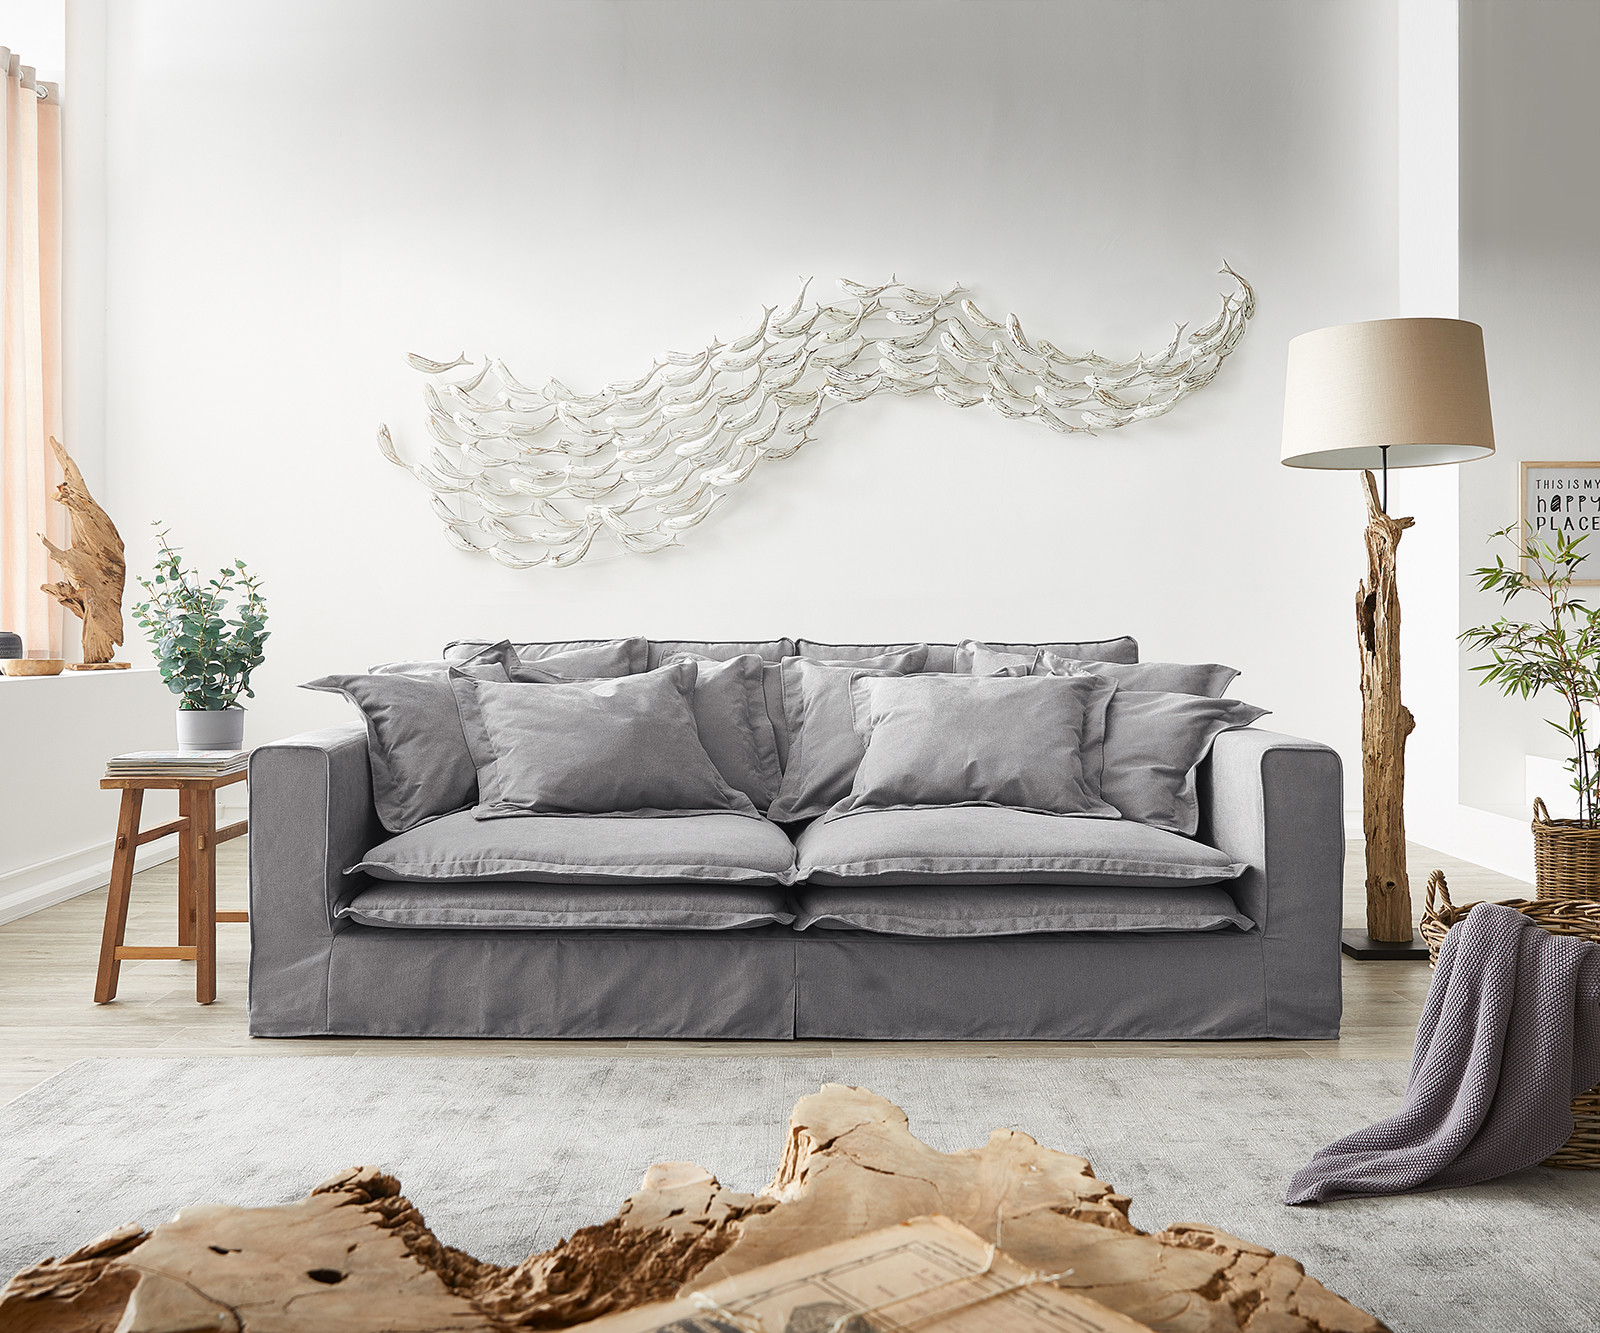 Hussensofa Noelia 240x140 cm Grau mit Kissen Bigsofa